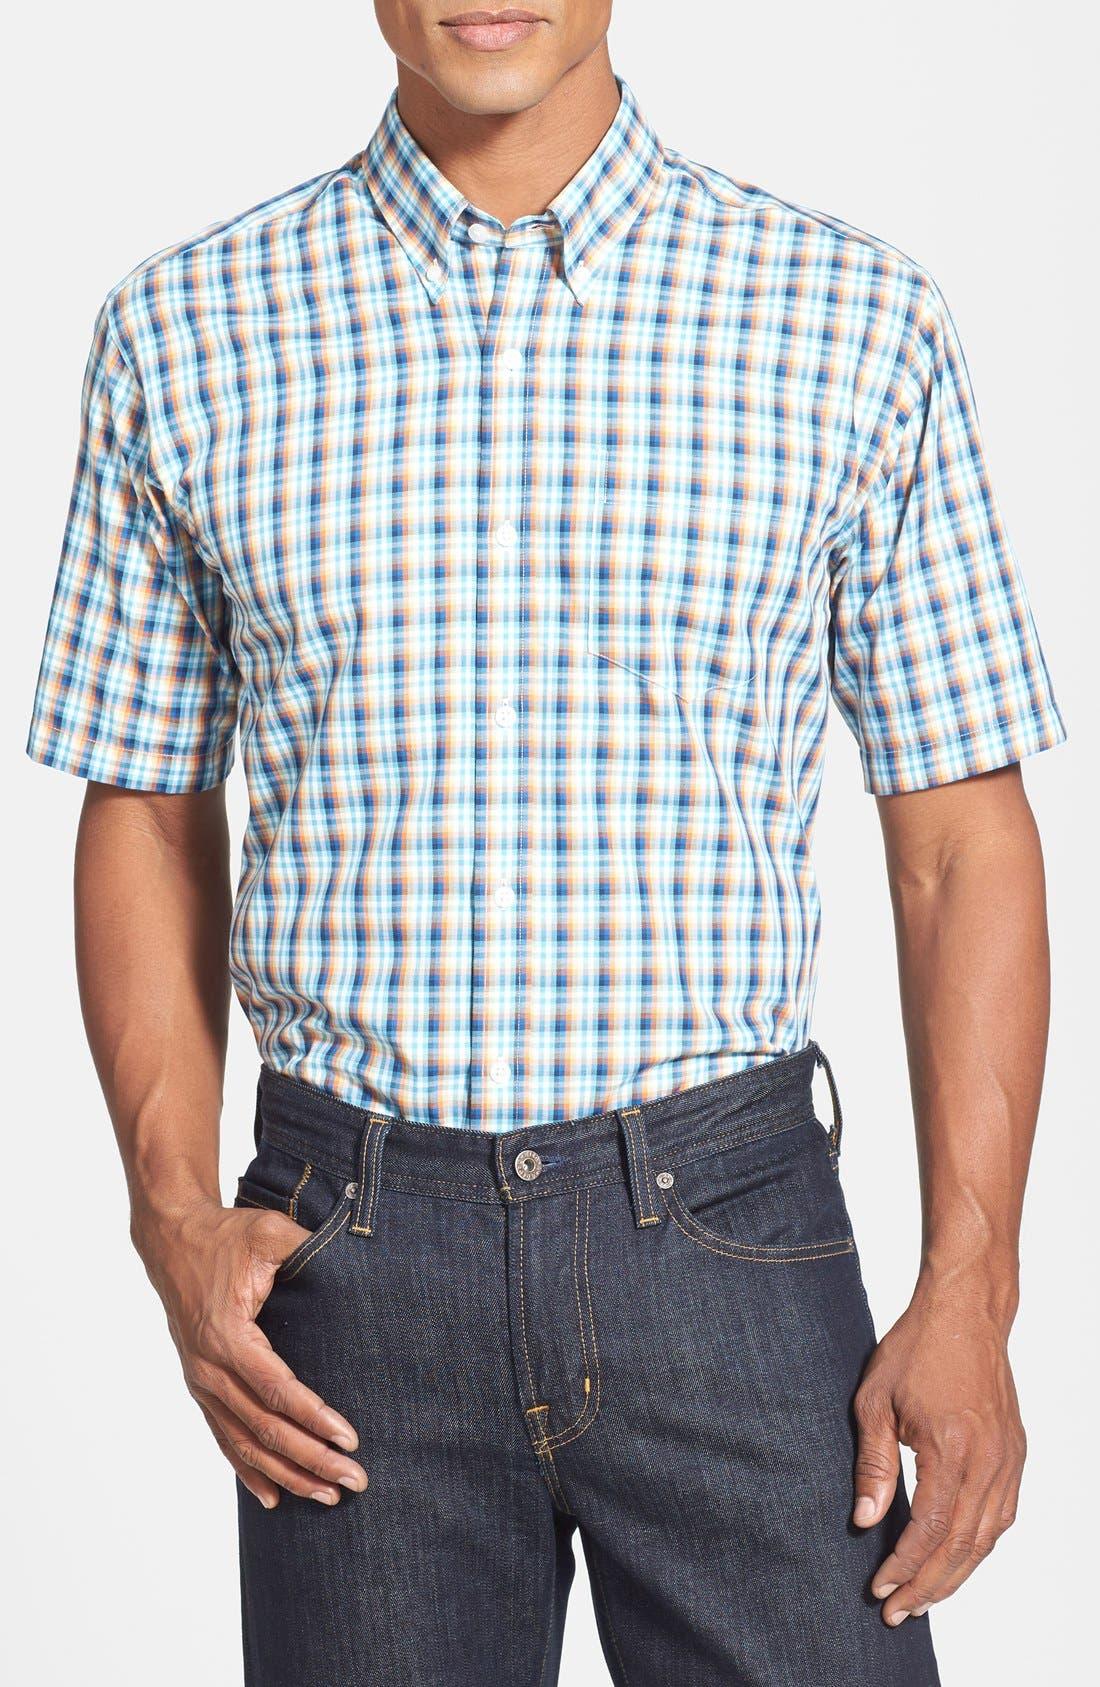 Main Image - Cutter & Buck 'Morton Road' Classic Fit Short Sleeve Plaid Sport Shirt (Big & Tall)